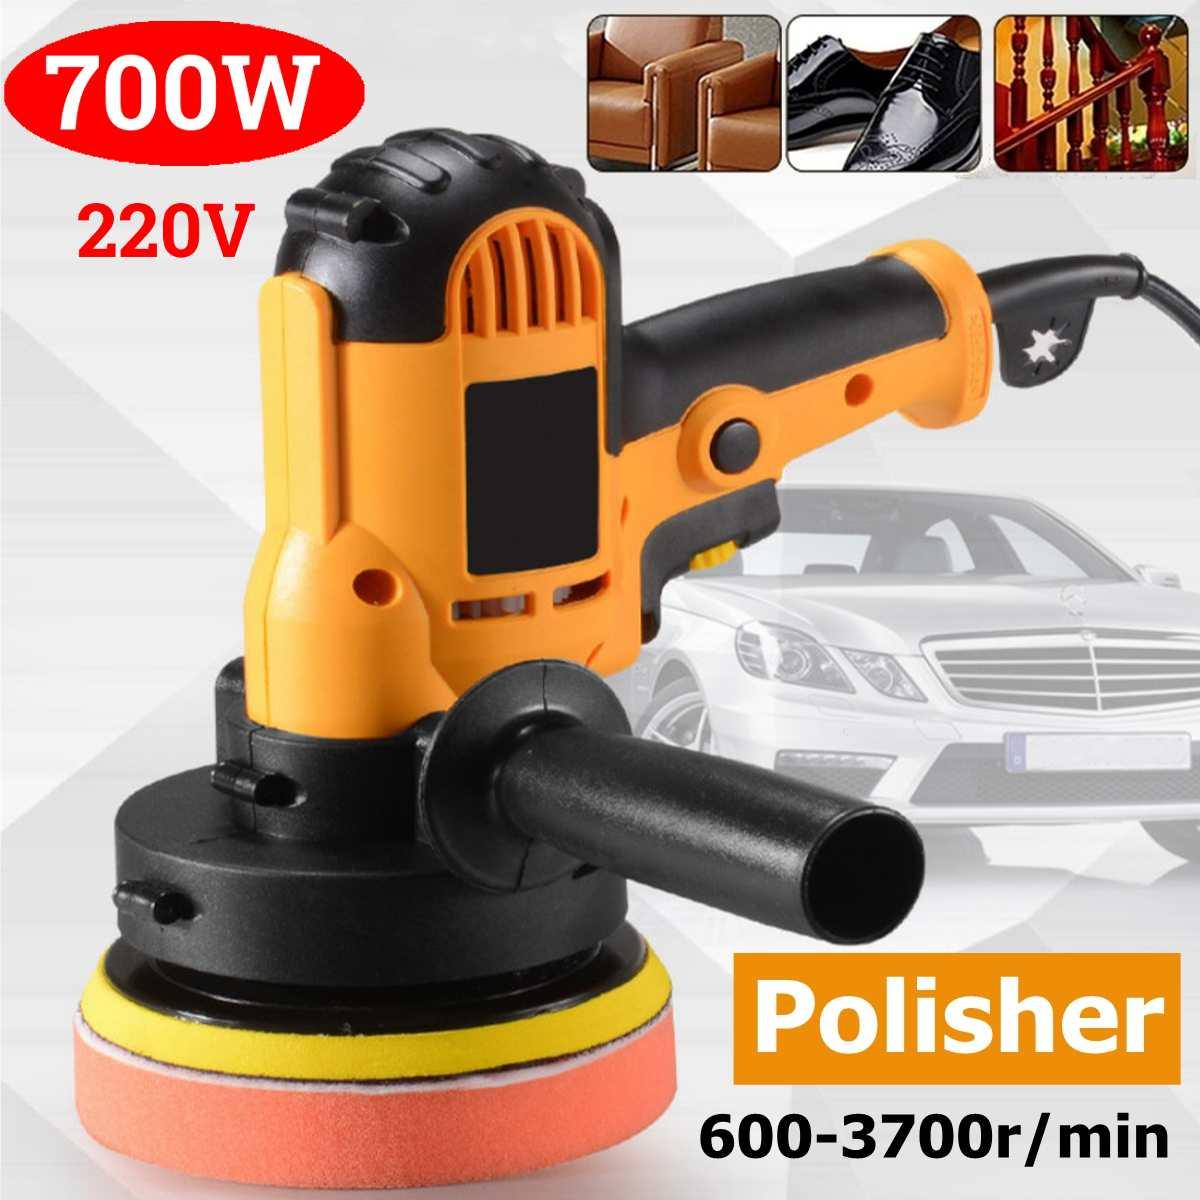 700w Buffer Polisher Machine Electric Car Polisher Waxer Variable Speeds Tool Household Waxing Polishing Machine